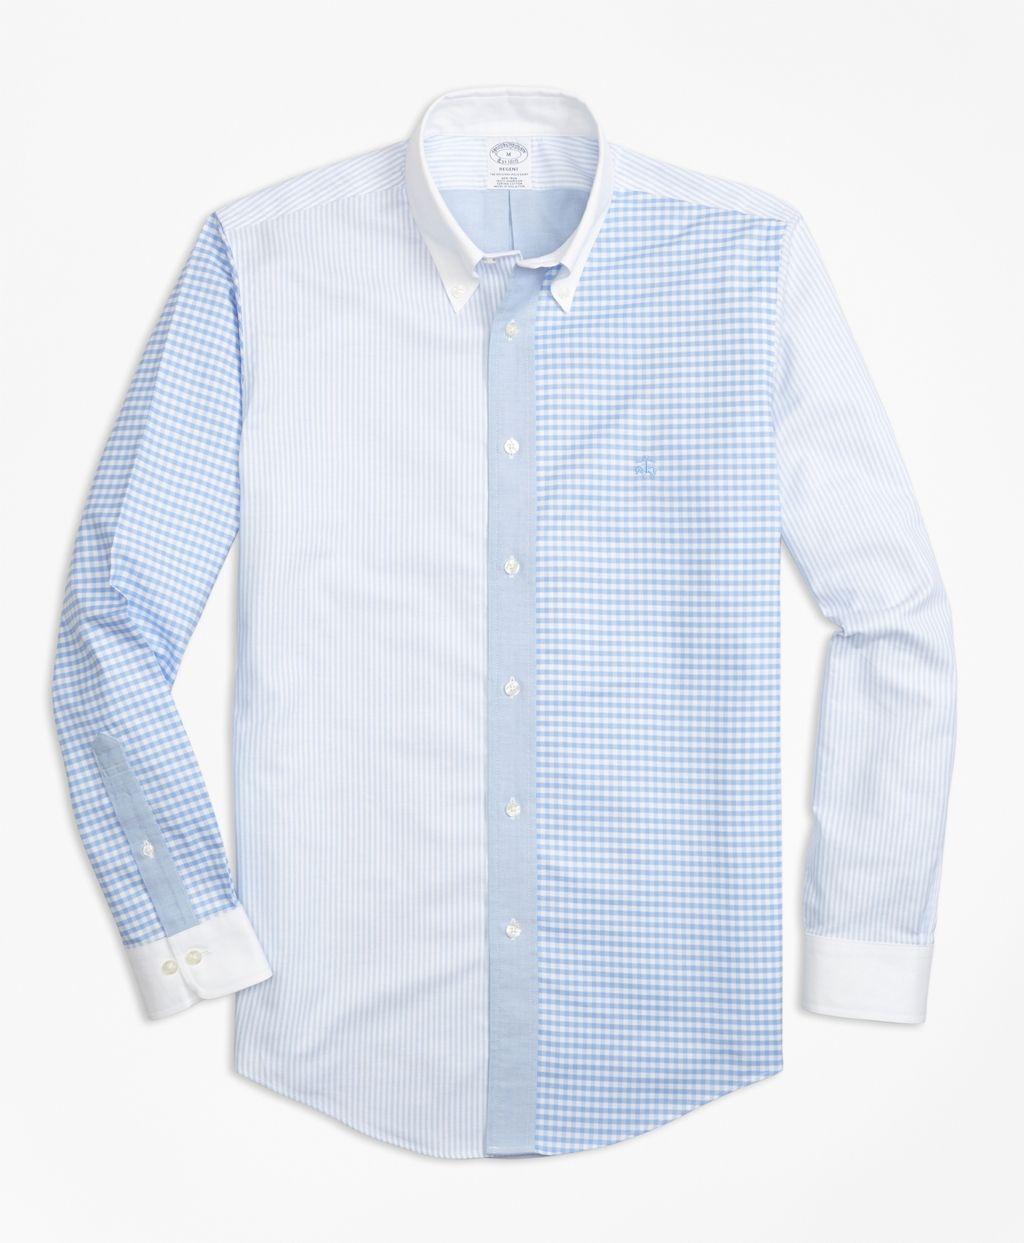 b499ea6c Non-Iron Regent Fit Fun Sport Shirt - Brooks Brothers Denim Shirt Men, Man